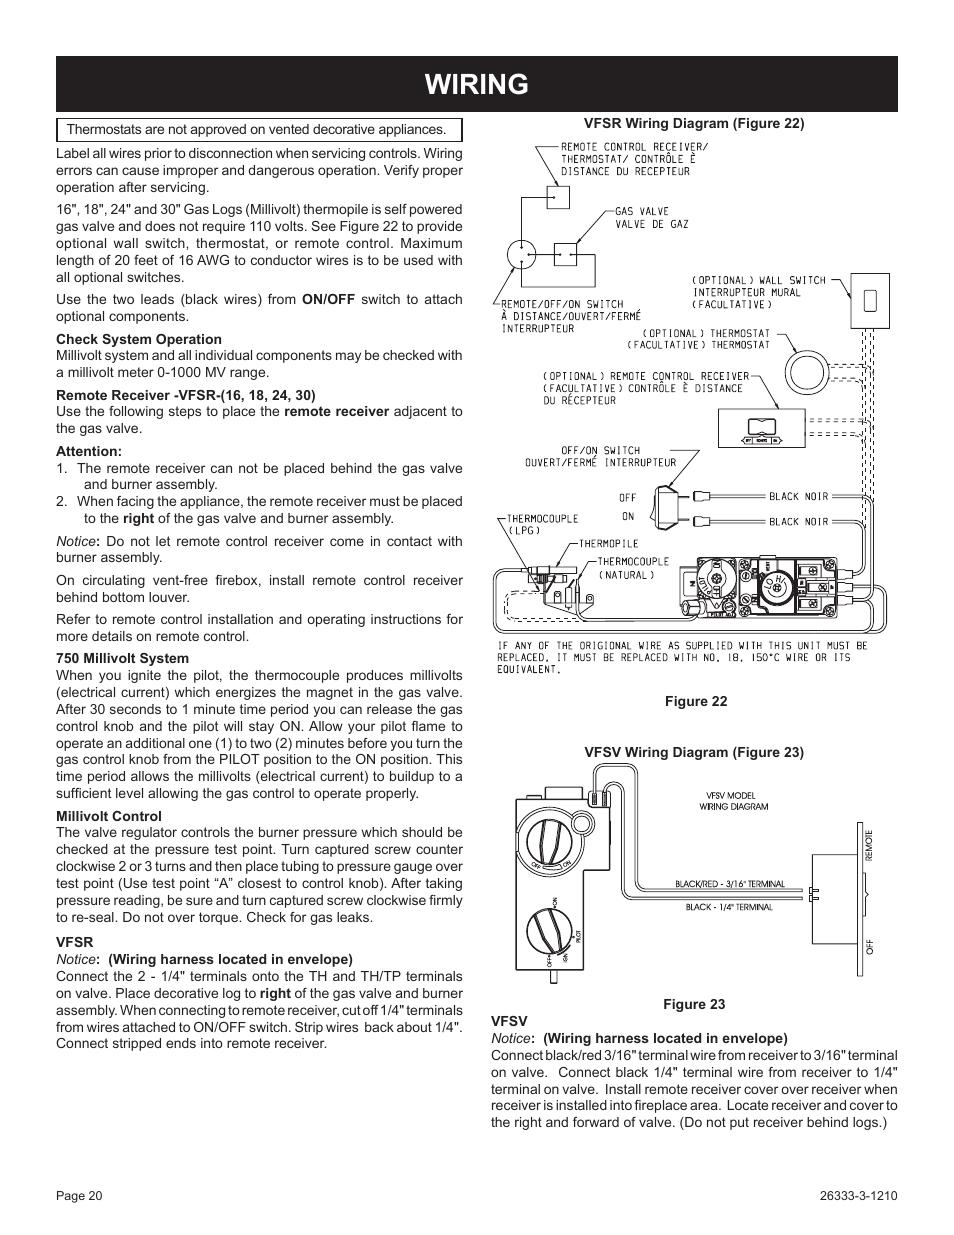 wiring empire comfort systems vfsr 24 3 user manual. Black Bedroom Furniture Sets. Home Design Ideas